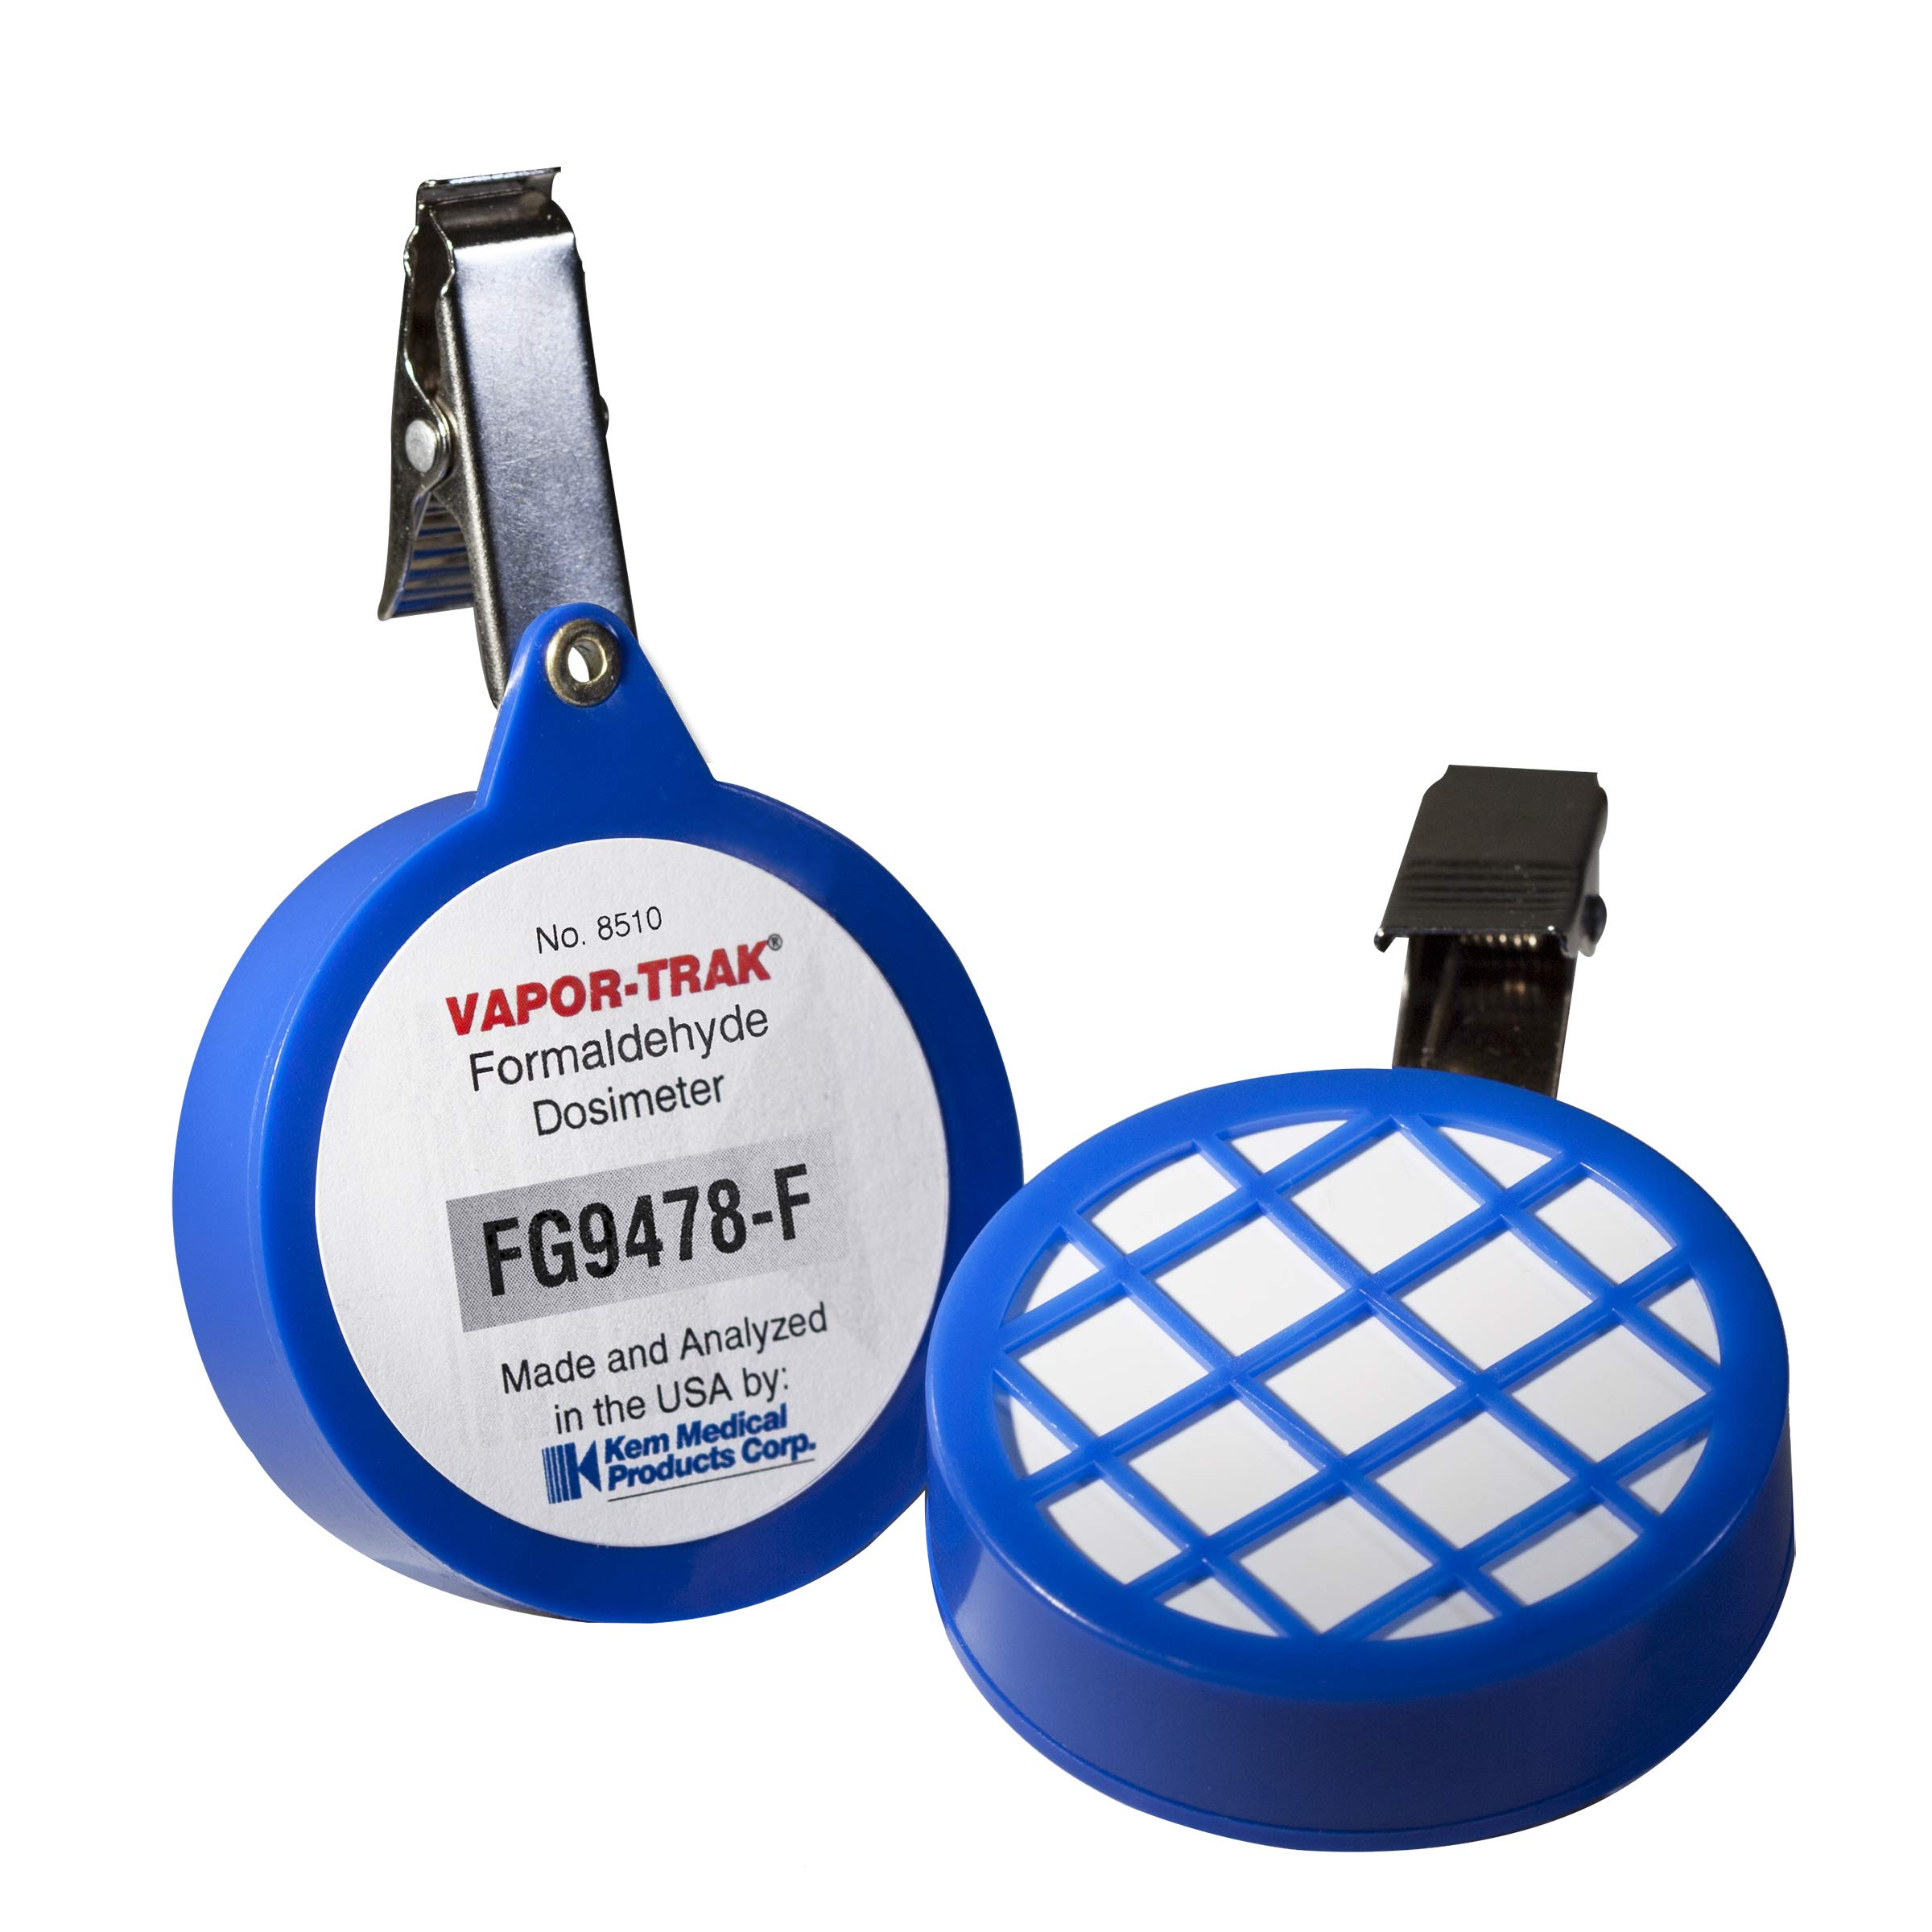 VAPOR-TRAK Formaldehyde Vapor Monitors (for Personal Safety Monitoring)- 4 per Box